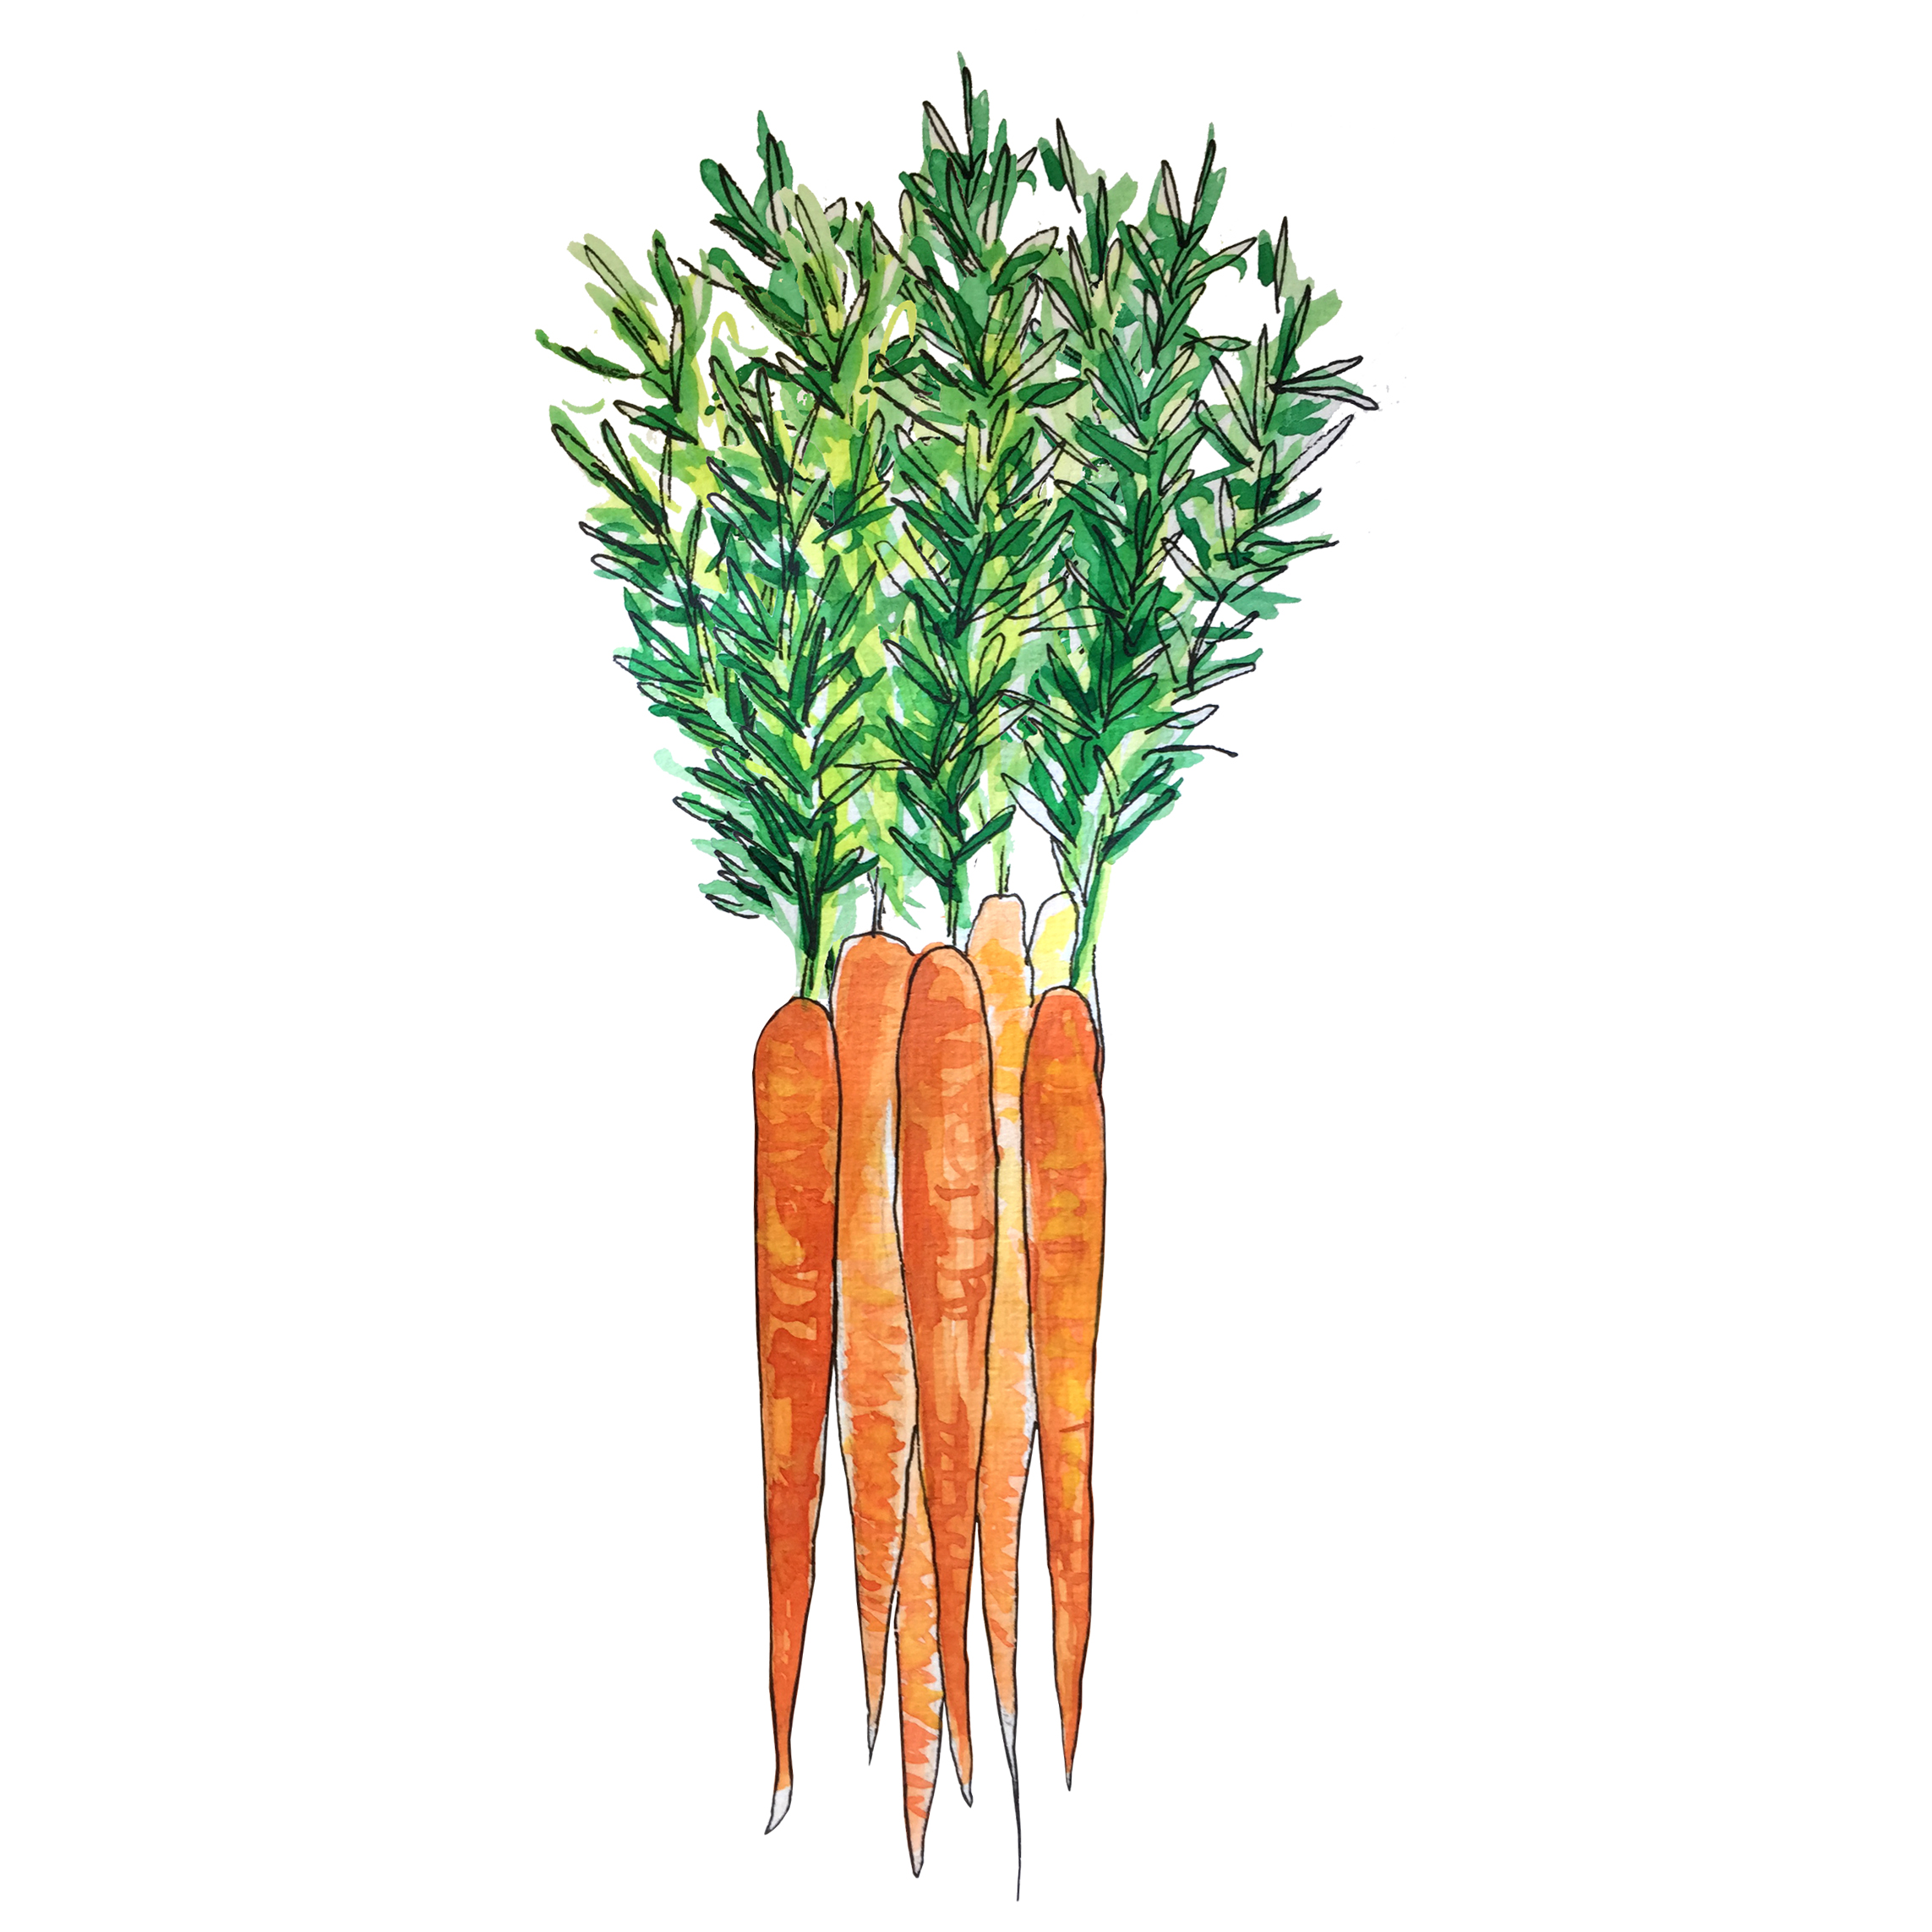 carrots_june2018_lyndsay.jpg